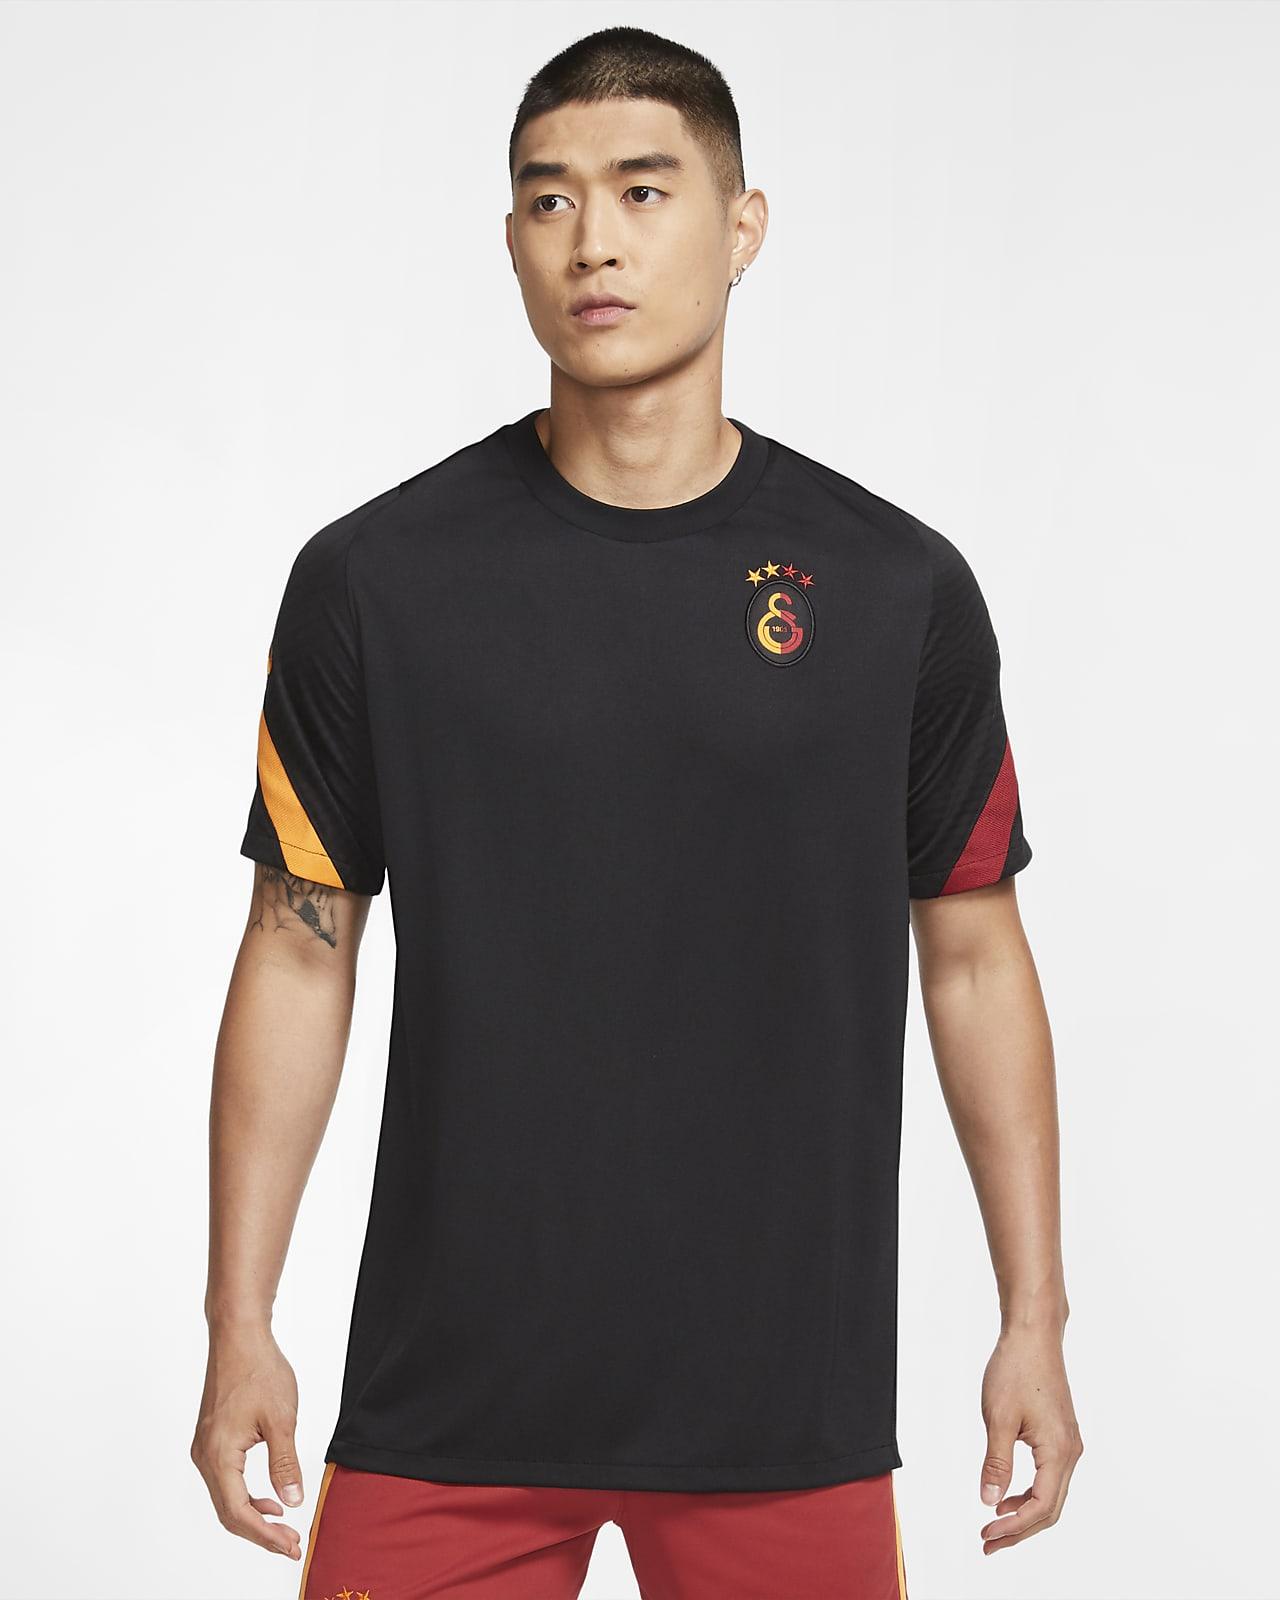 Camiseta de fútbol de manga corta para hombre Galatasaray Strike